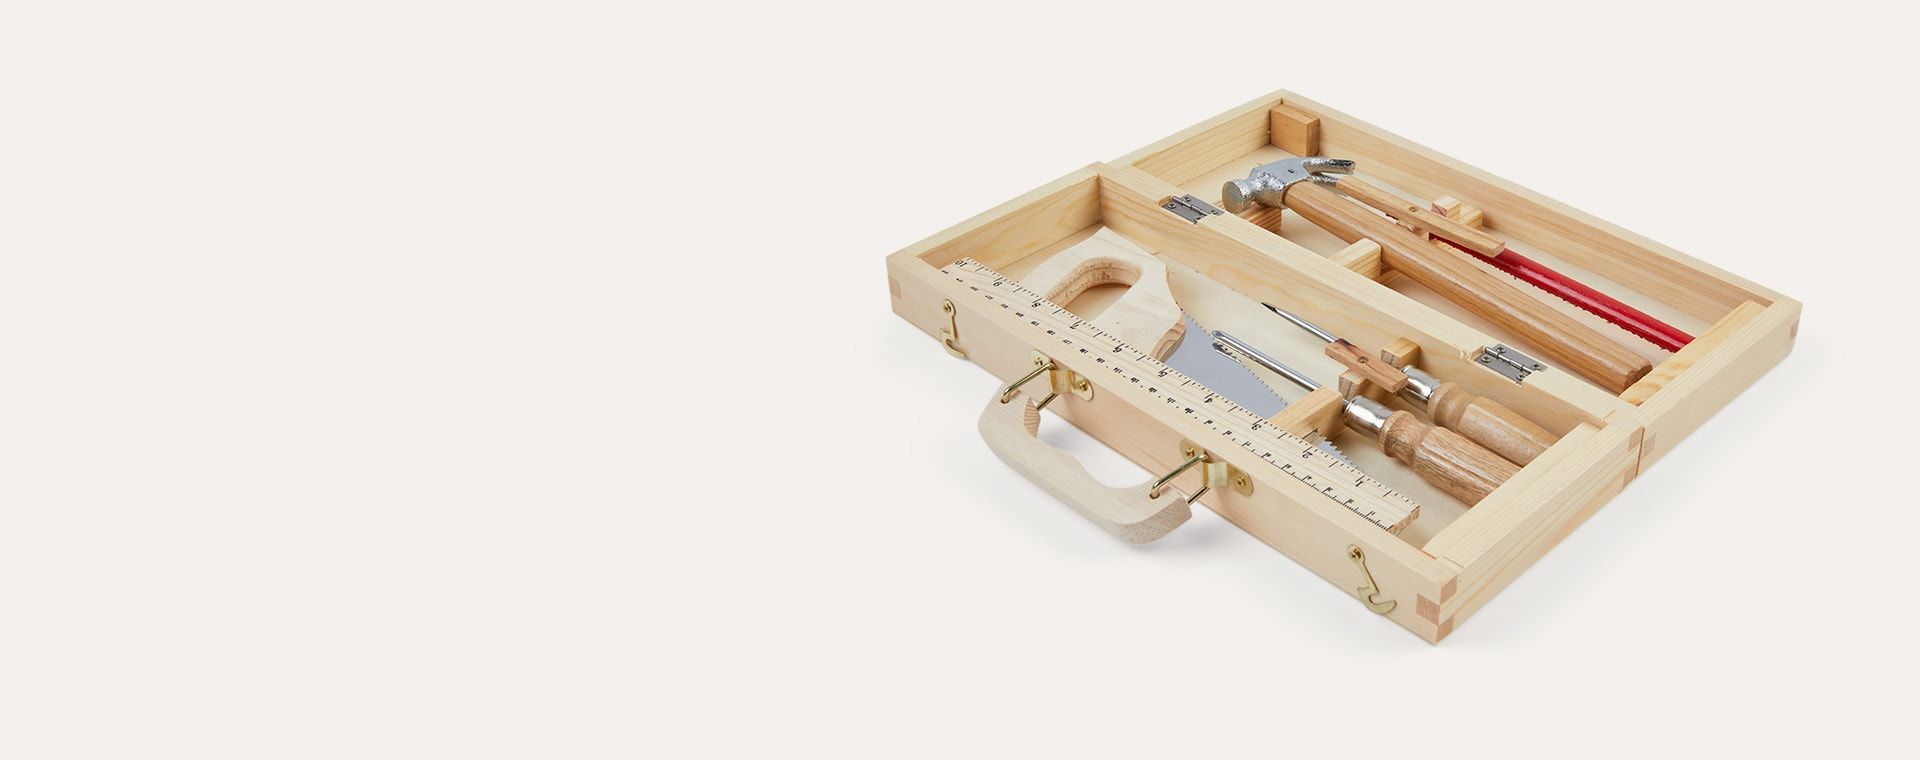 Multi Moulin Roty Small Tool Box Set